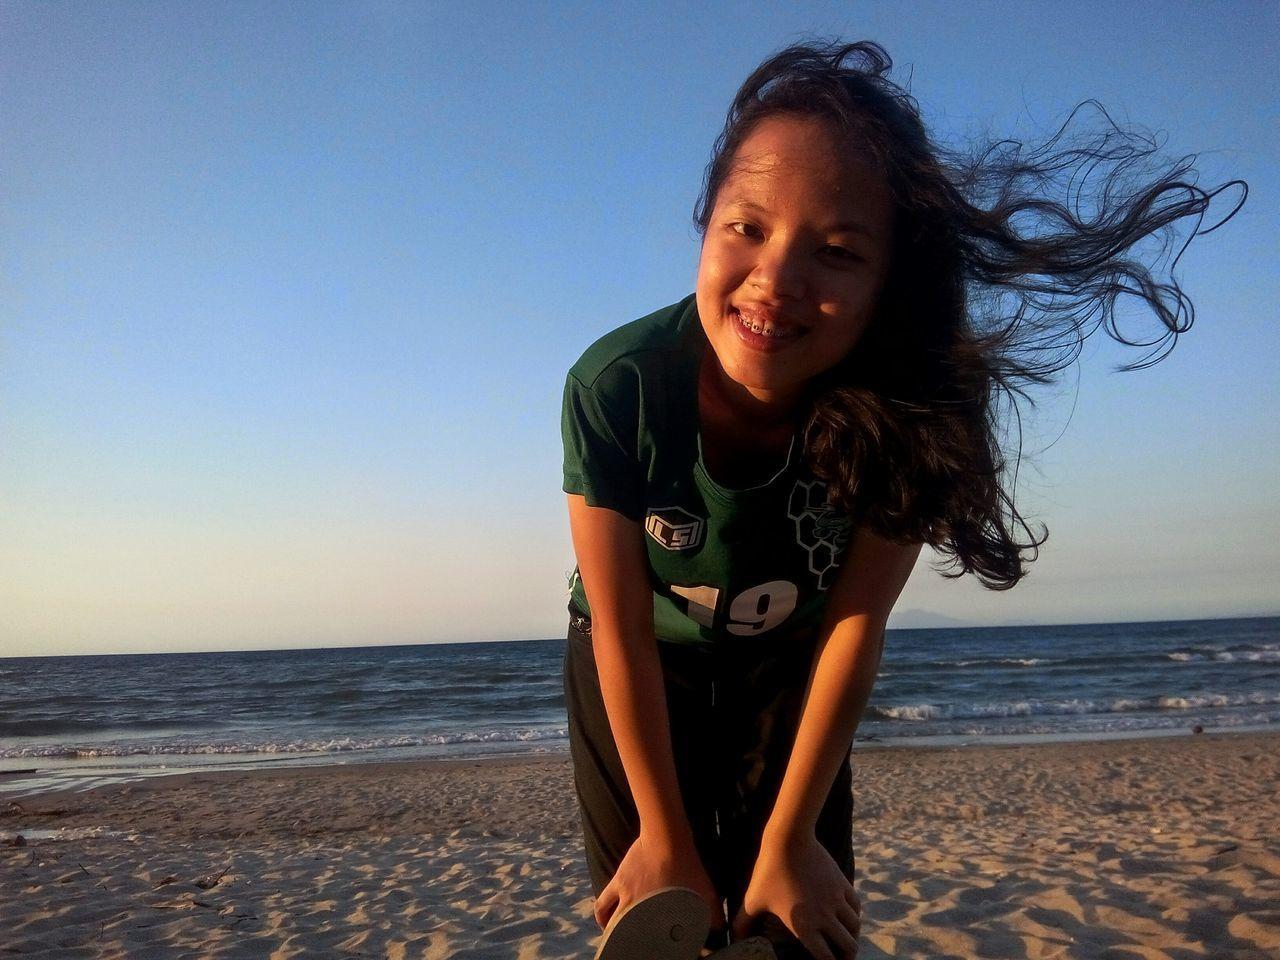 Beautiful stock photos of ostern, beach, sky, young adult, sea